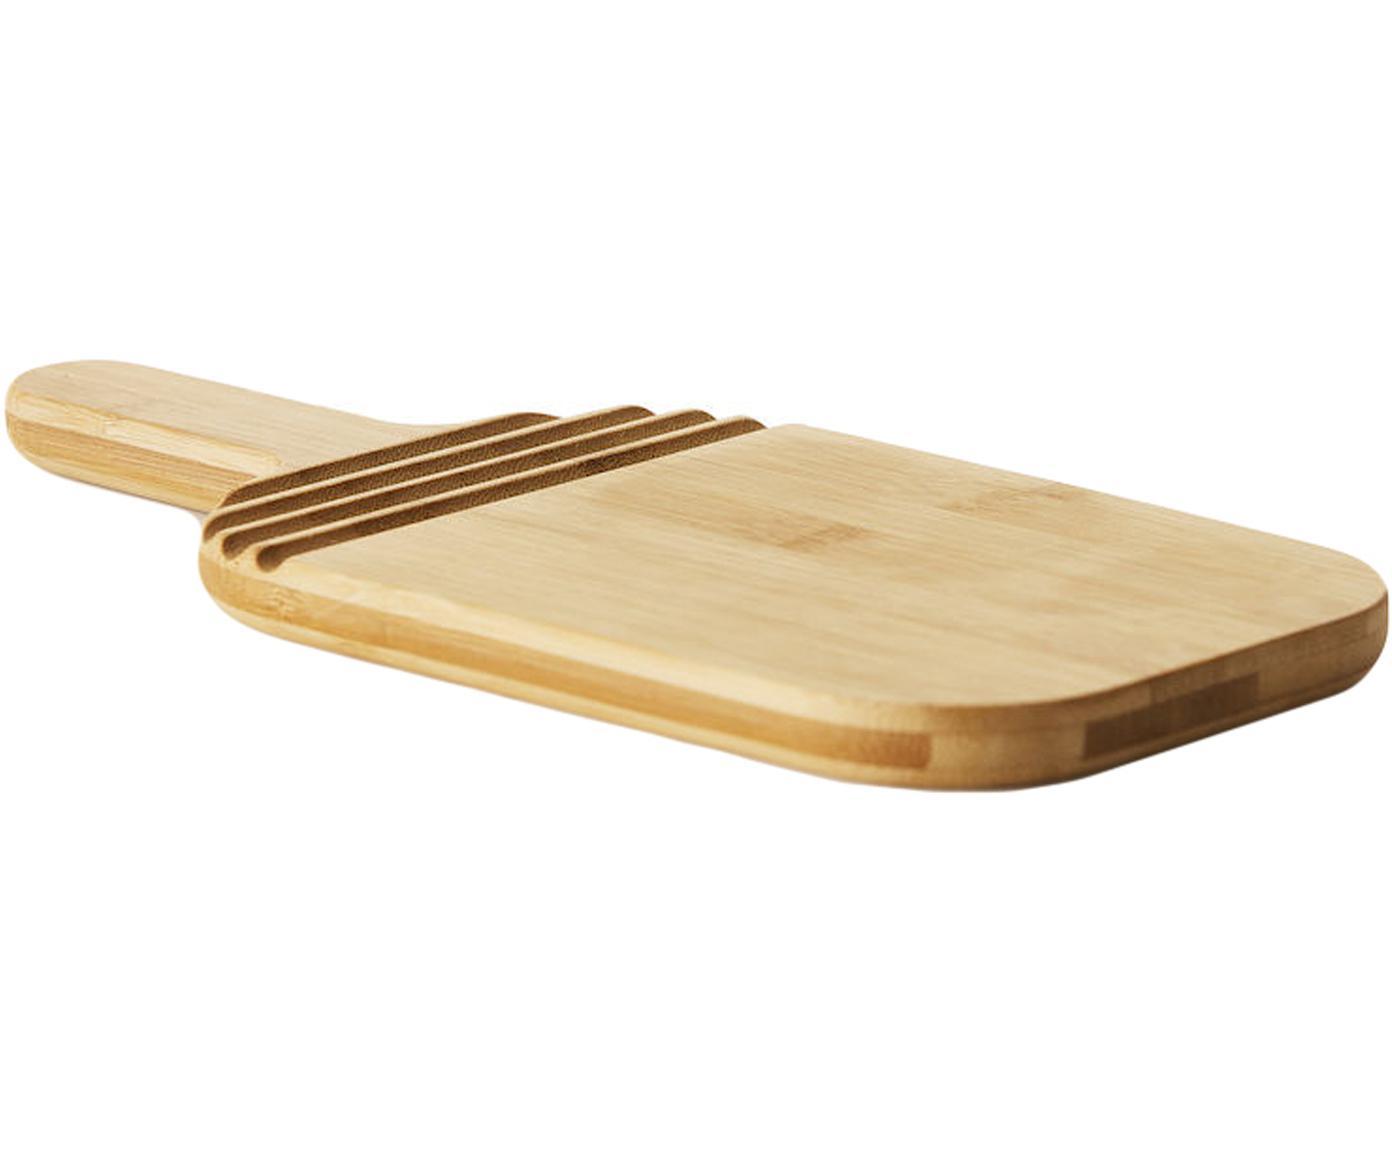 Bamboe snijplank Monazi, Bamboehout, Bamboehoutkleurig, 27 x 2 cm